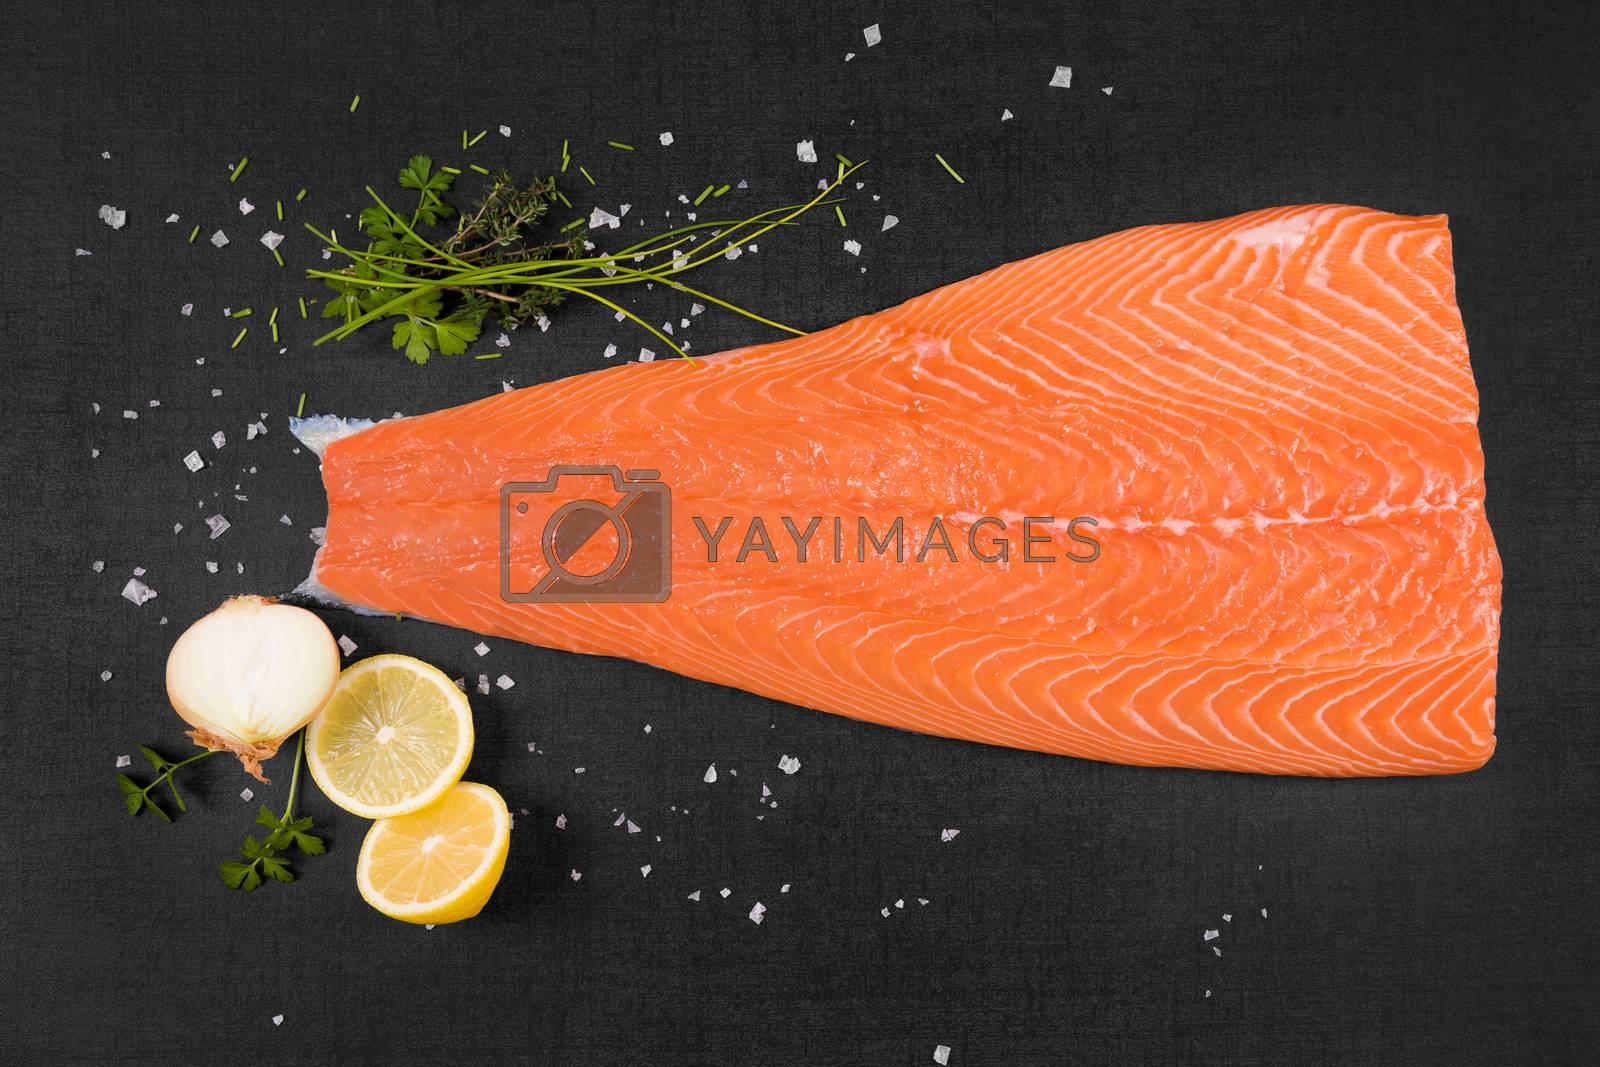 Fresh raw salmon background. Salmon steak, lemon, rosemary and parsley leaf and salt on black background, flat lay.